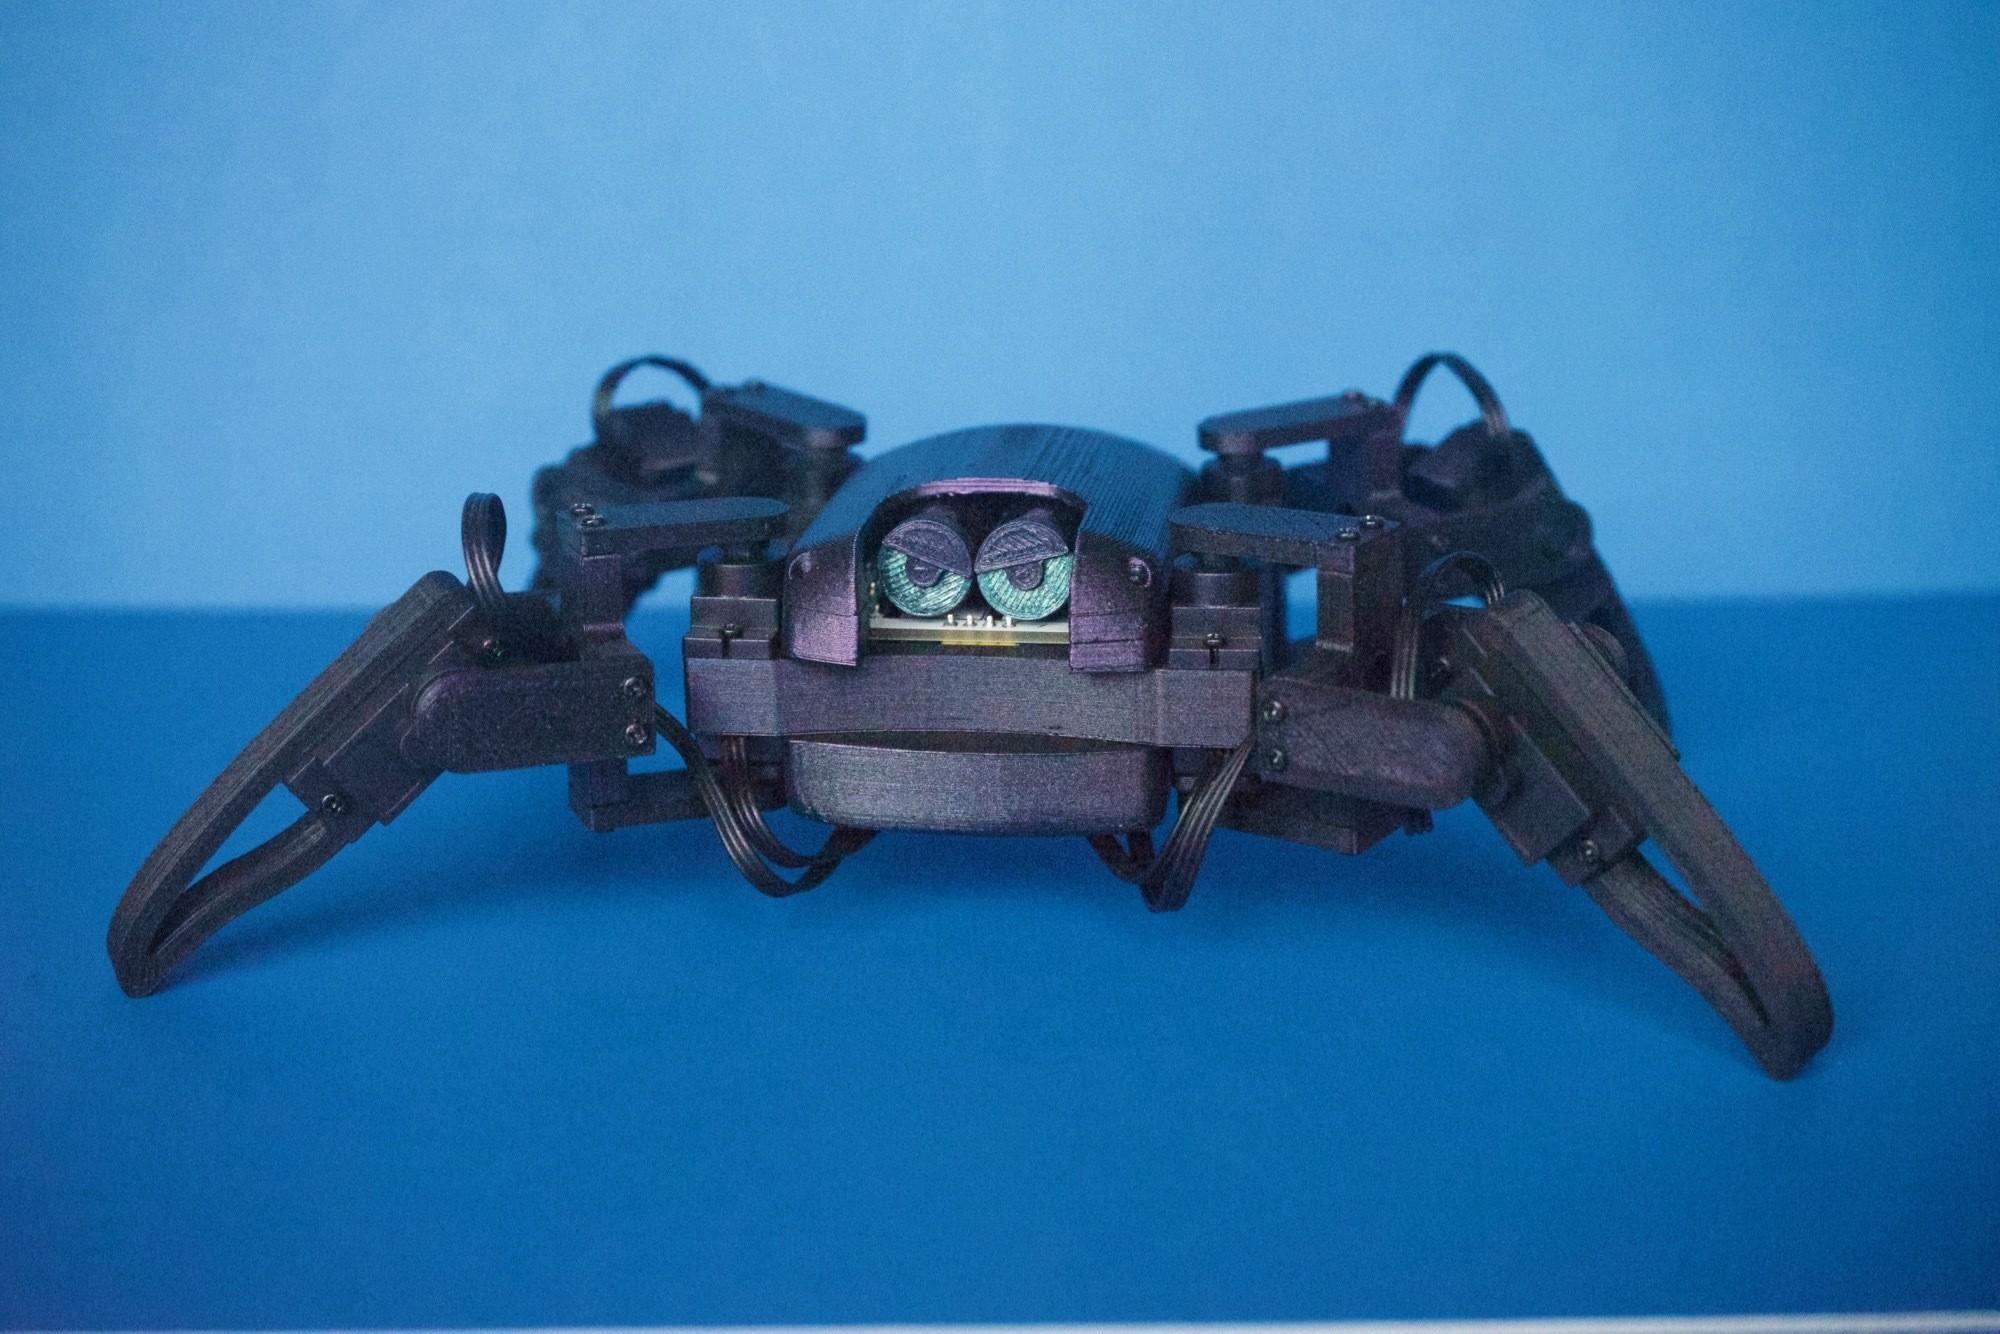 Q1mini001.jpg Download free STL file Q1 mini Quadruped Robot 2.0 (Designed by Jason Workshop) • 3D printing design, Jason8866